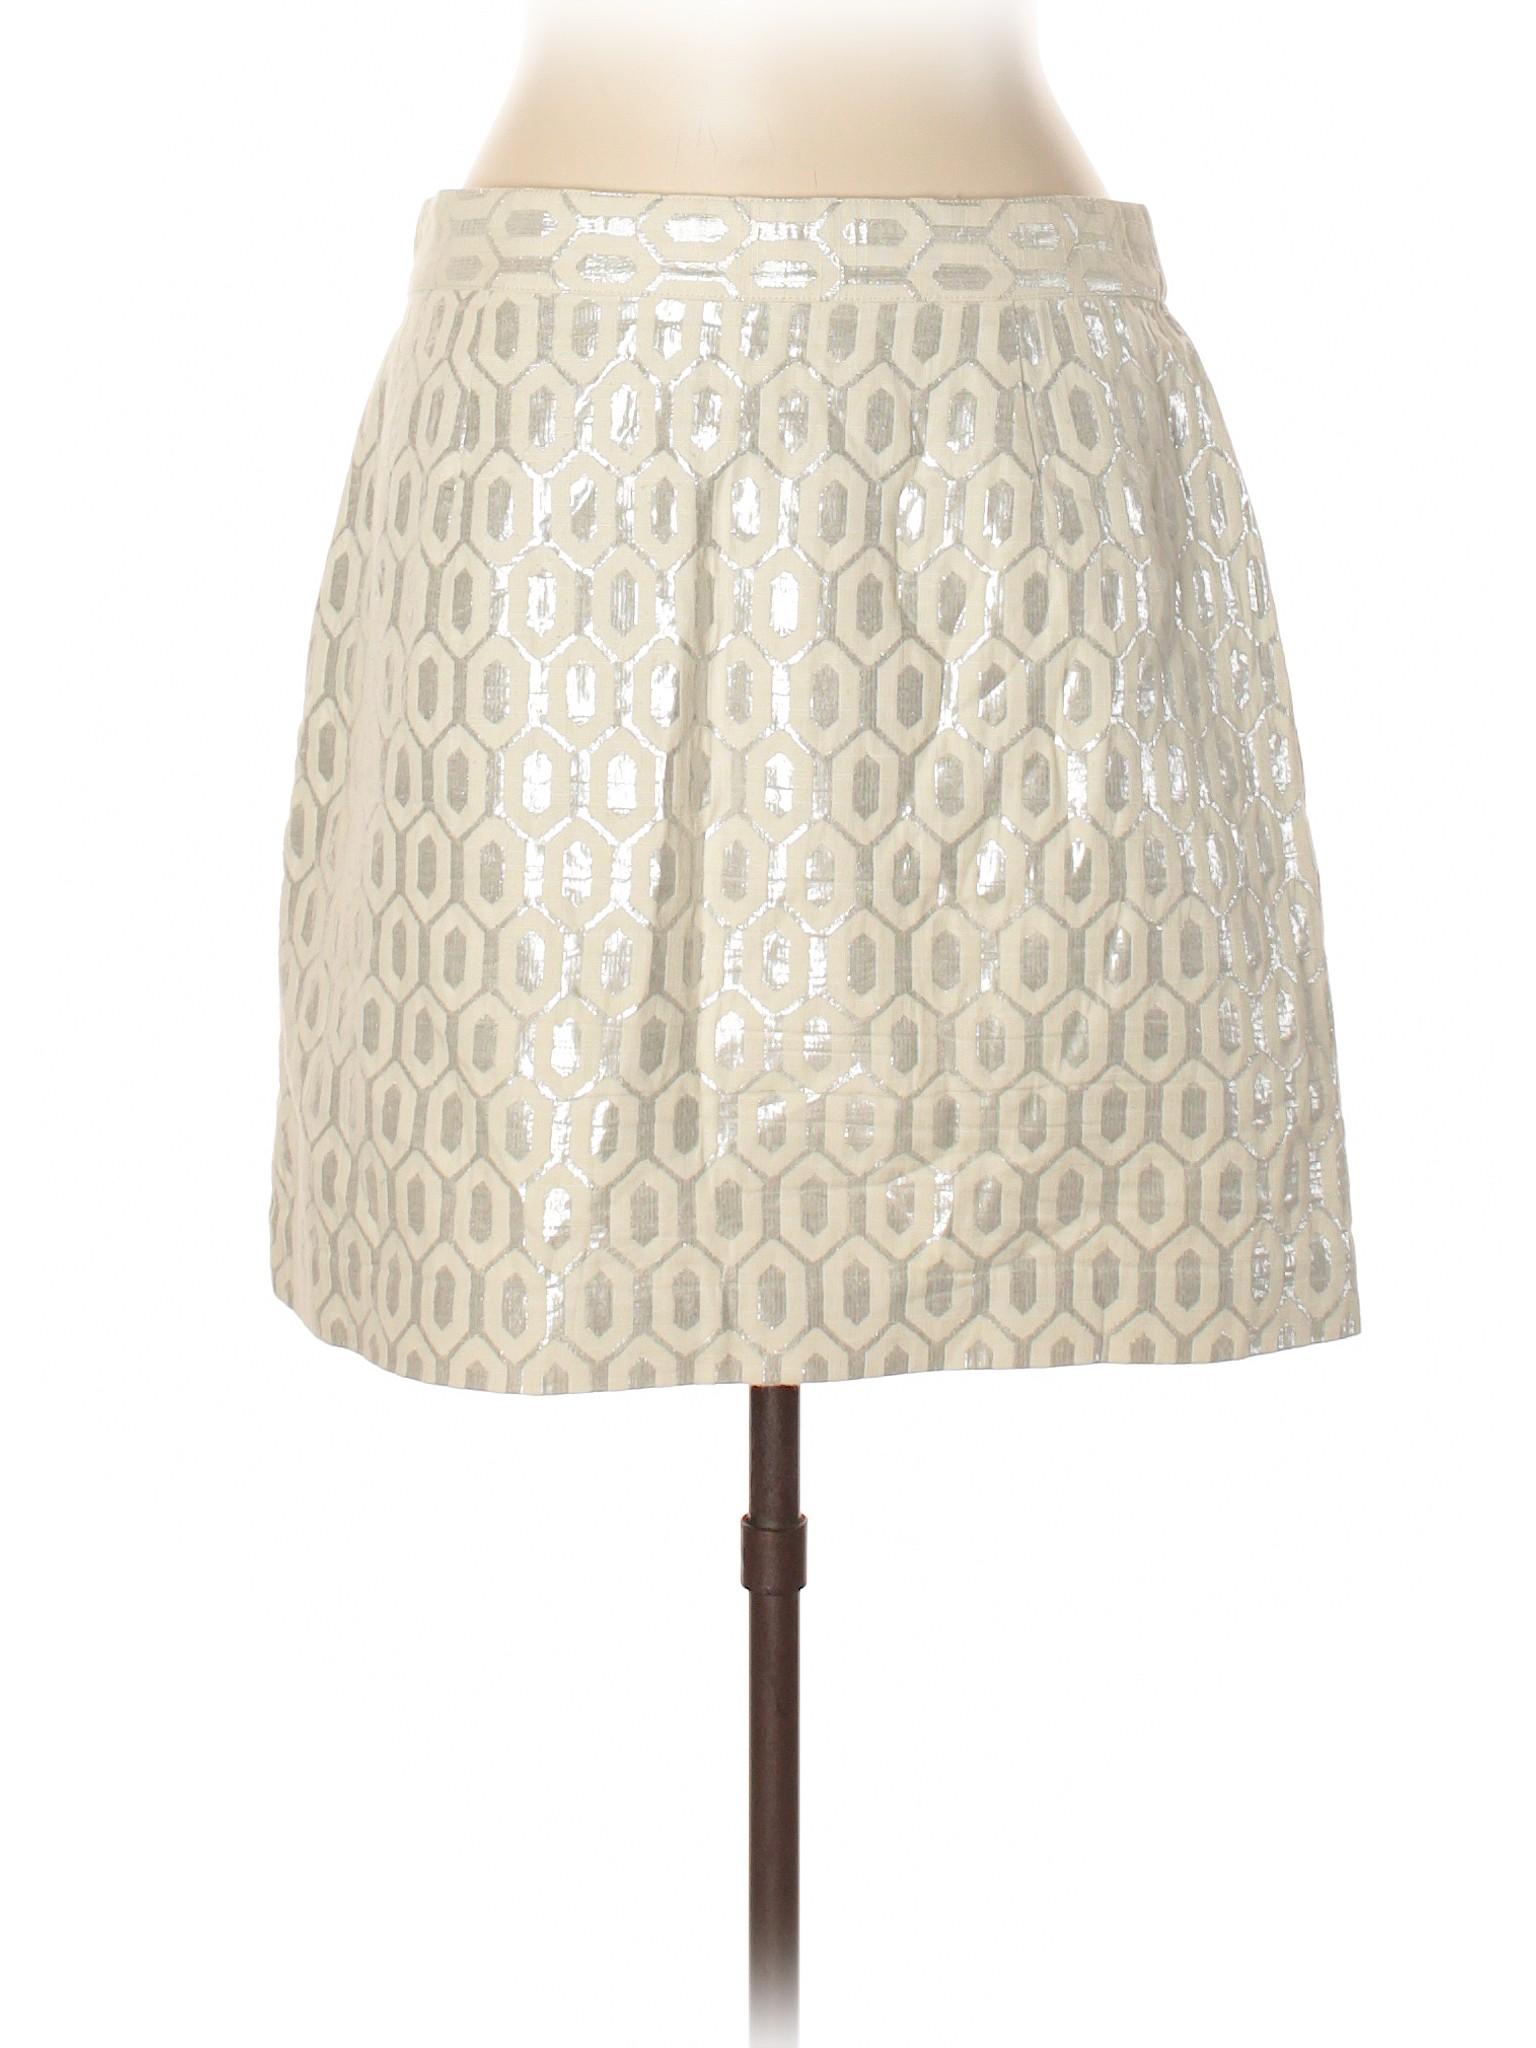 Casual Boutique Boutique Skirt Casual Skirt Boutique Casual 68zIwX0qn